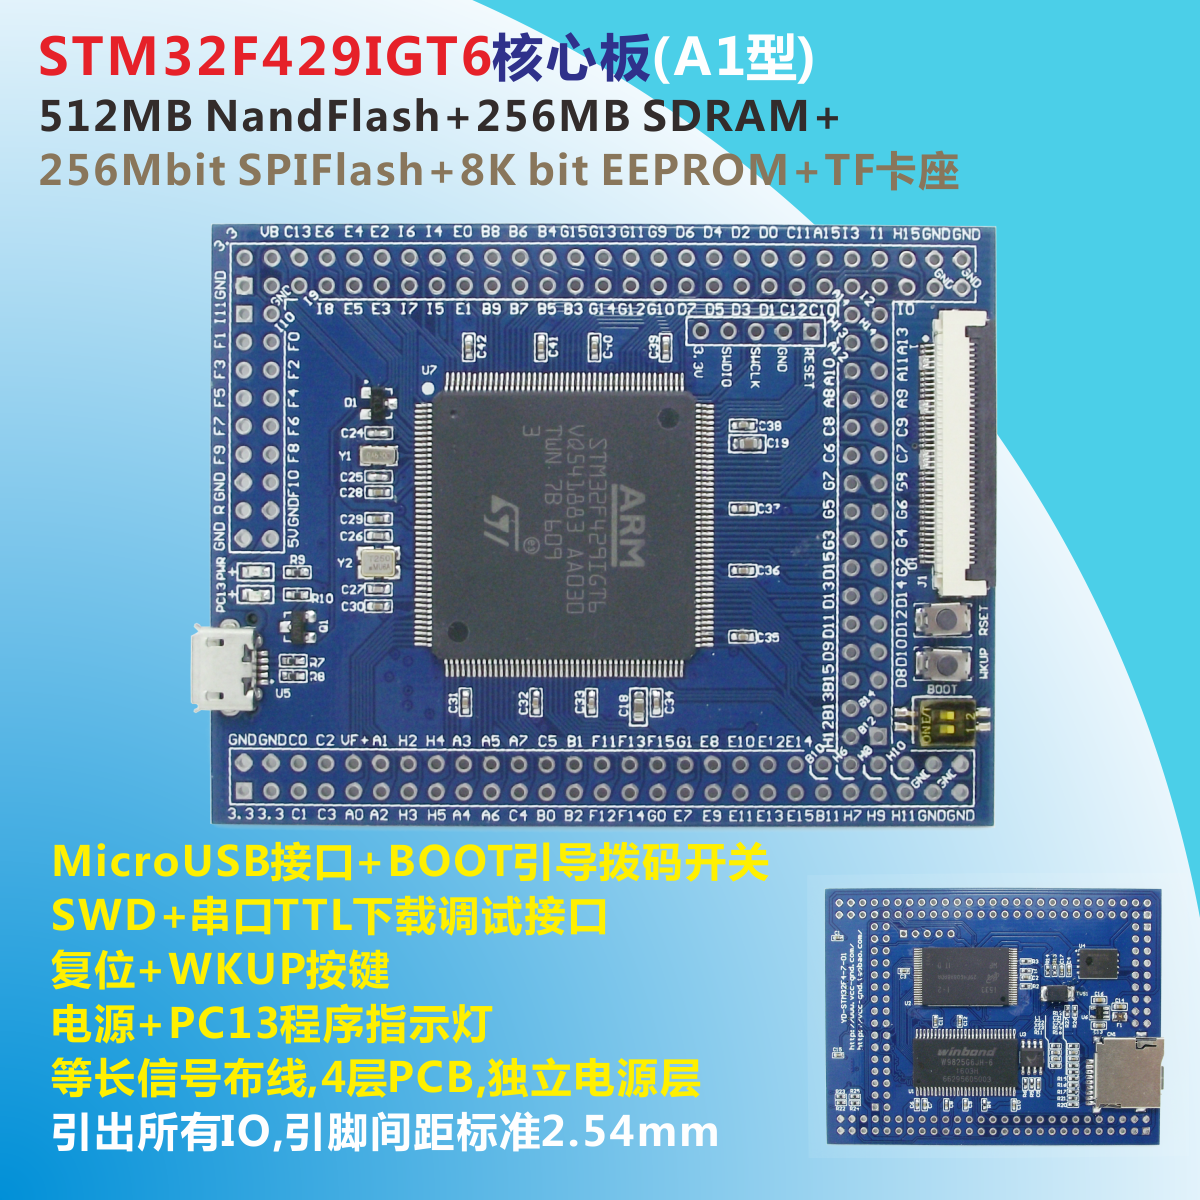 1098a4c0136 STM32F429IGT6 Core Board +NandFlash+SDRAM+SPIFlash+EEPROM (type A1)